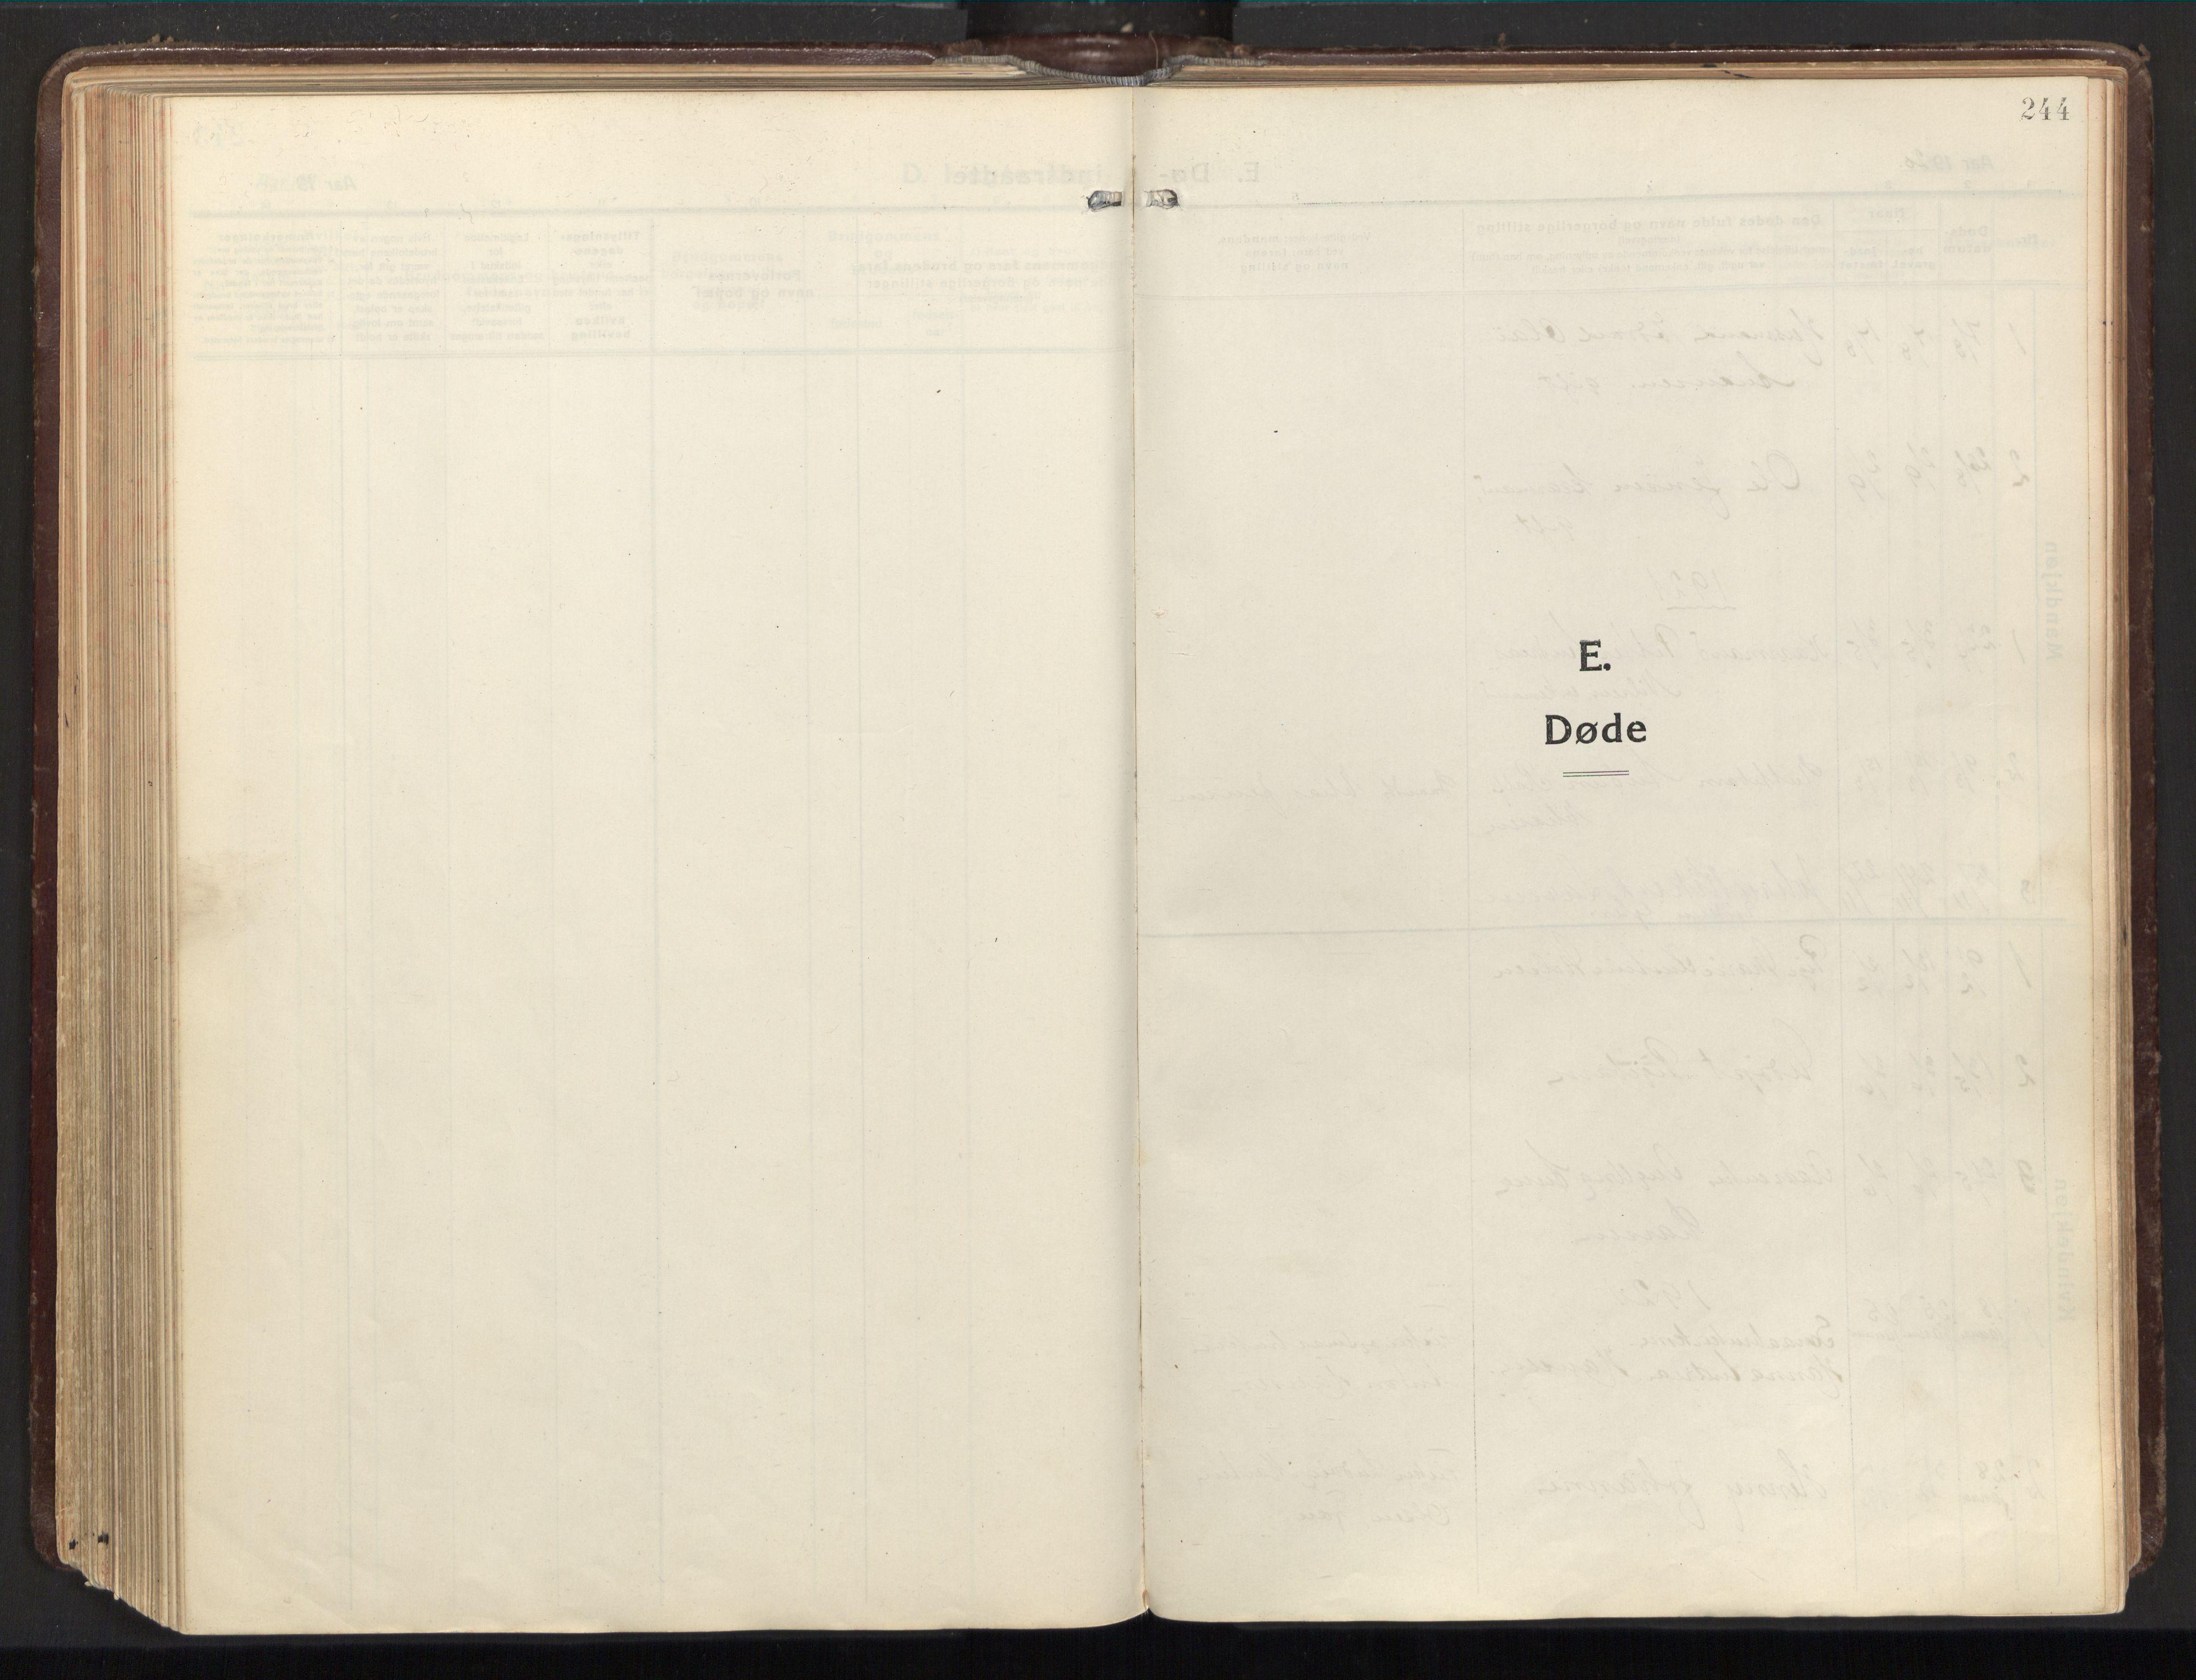 SAT, Ministerialprotokoller, klokkerbøker og fødselsregistre - Nordland, 803/L0073: Ministerialbok nr. 803A03, 1920-1955, s. 244